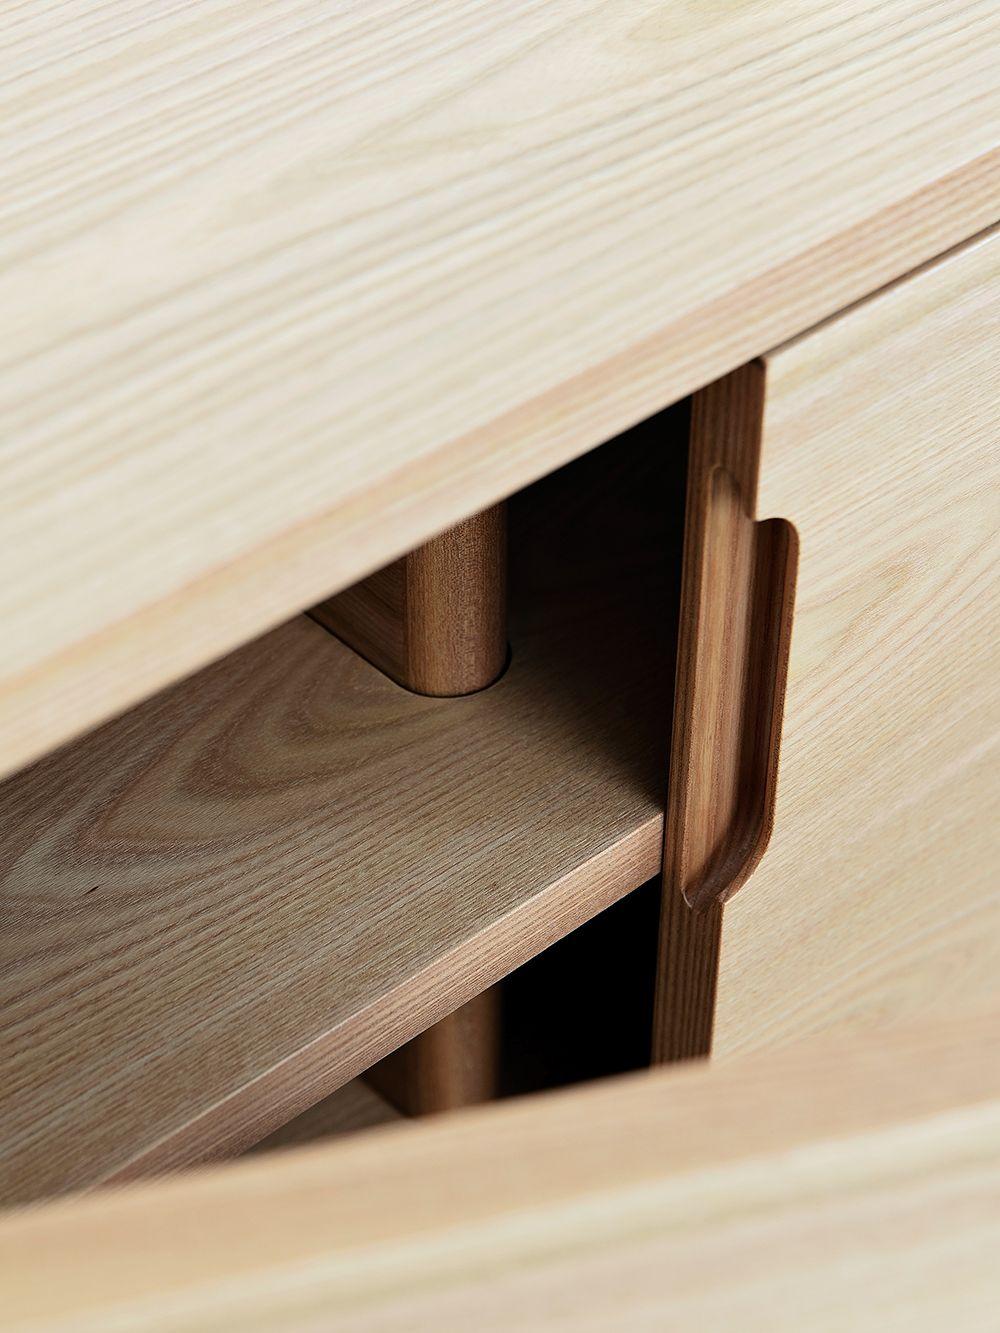 Wooden Credenza Uno sideboard by Harri Koskinen